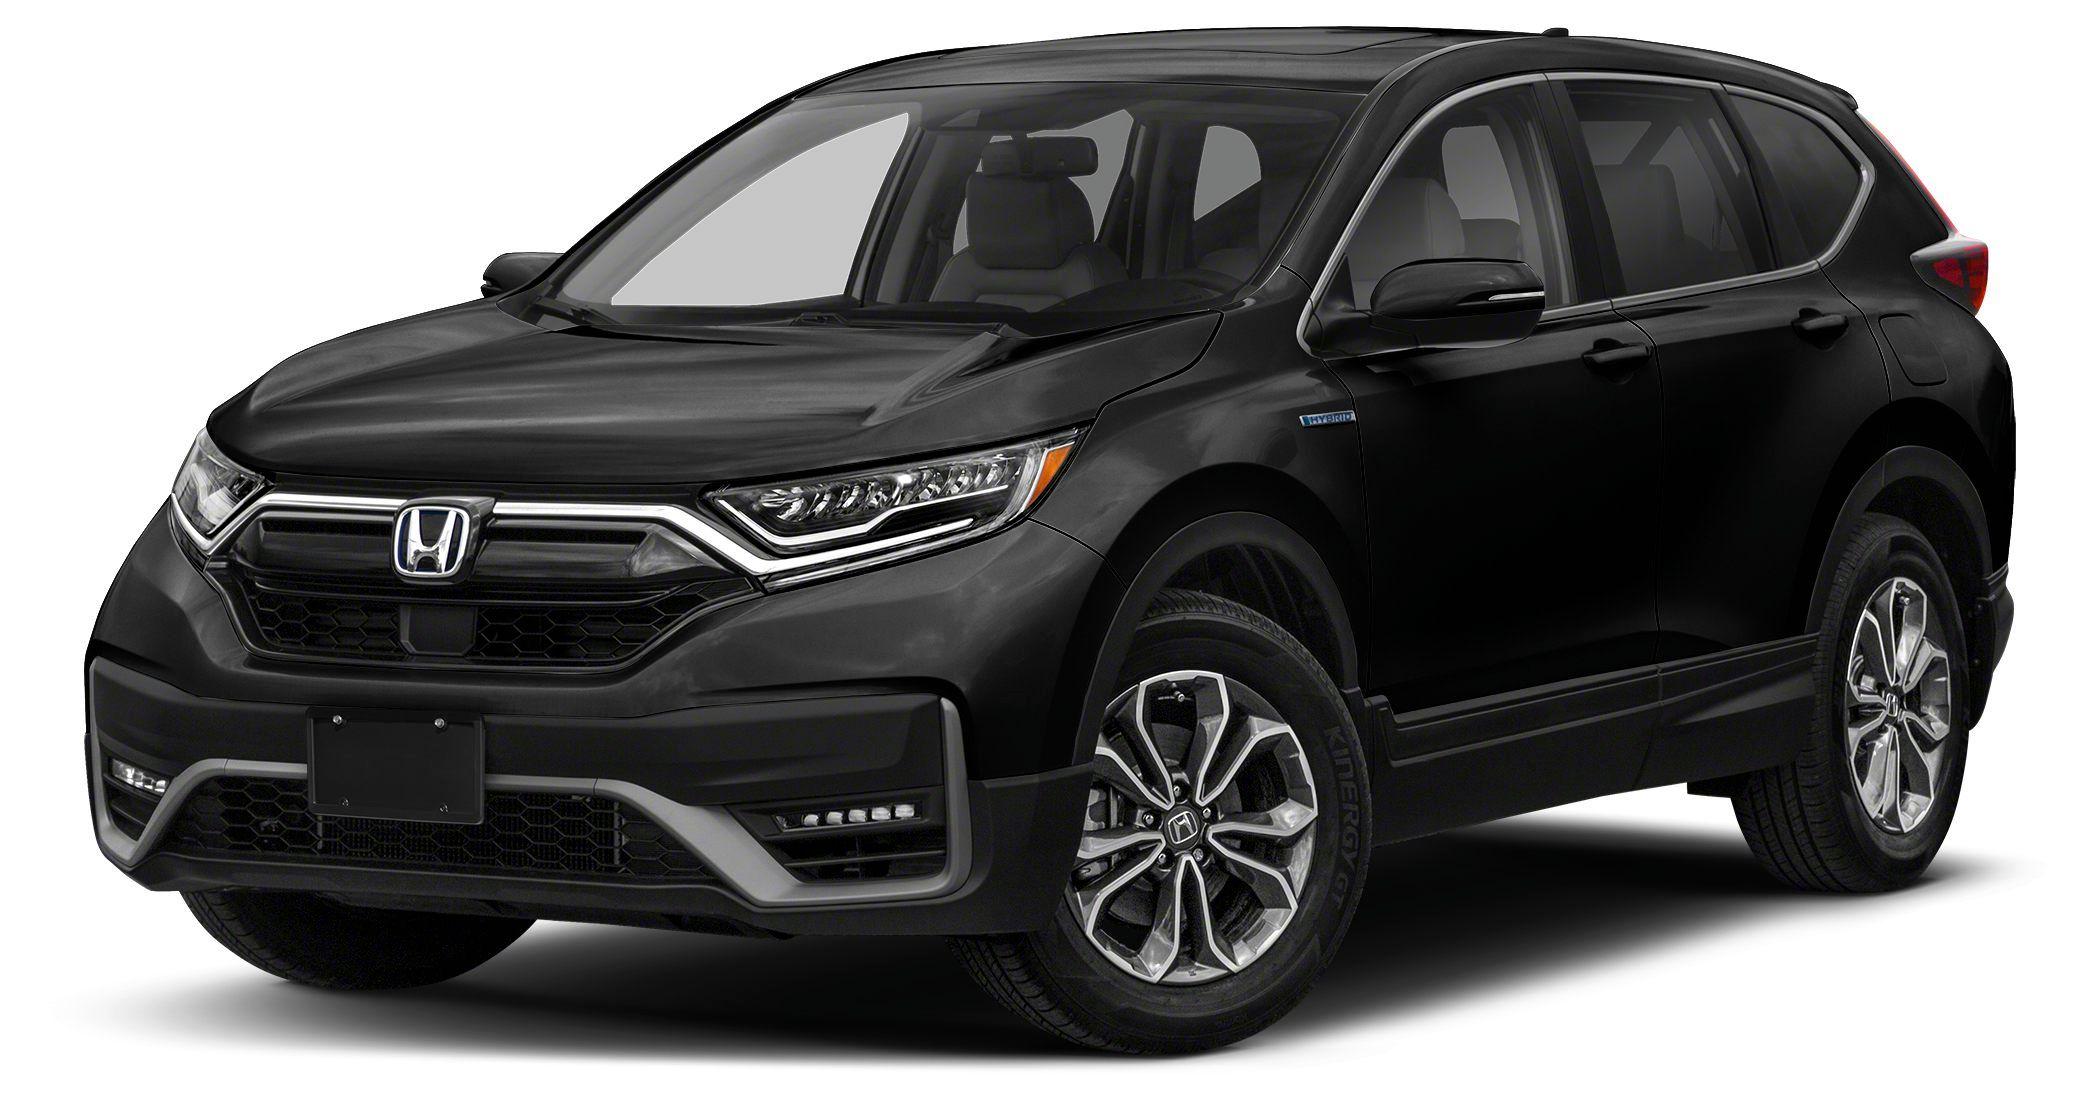 Image 2021 Honda Cr-v hybrid EX-L